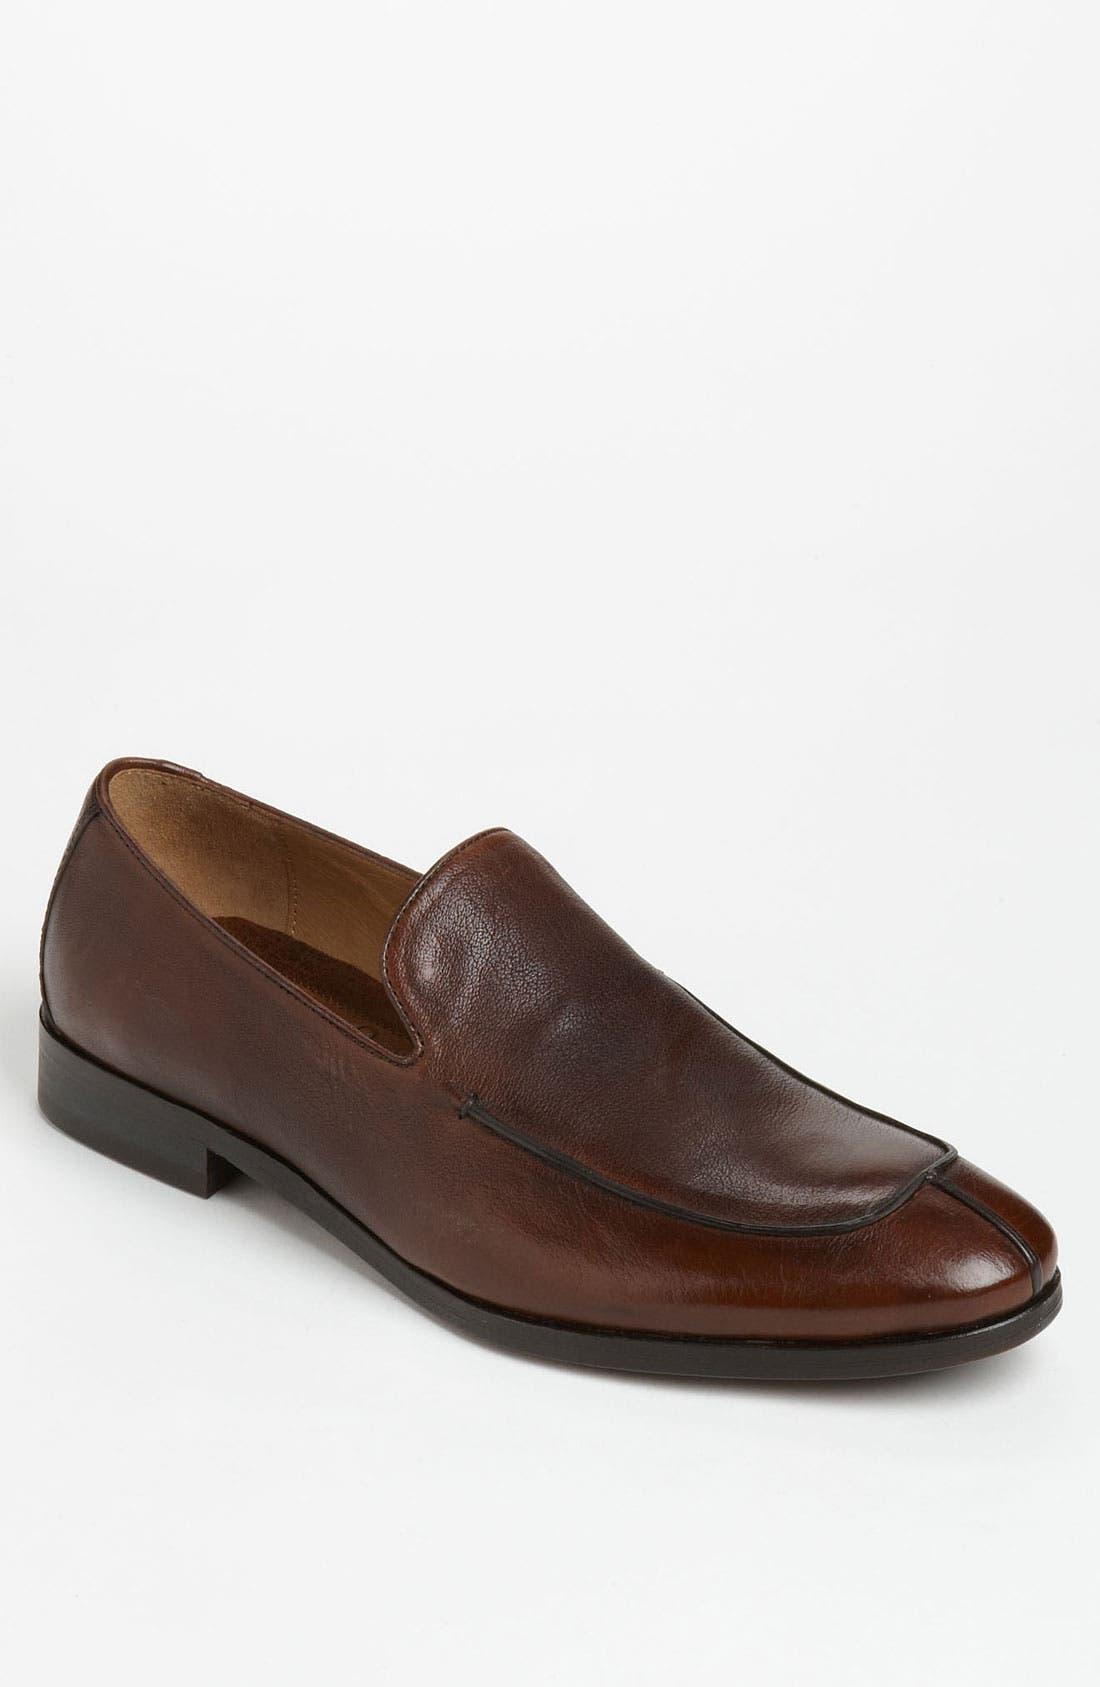 Alternate Image 1 Selected - Vince Camuto 'Ennah' Split Toe Loafer